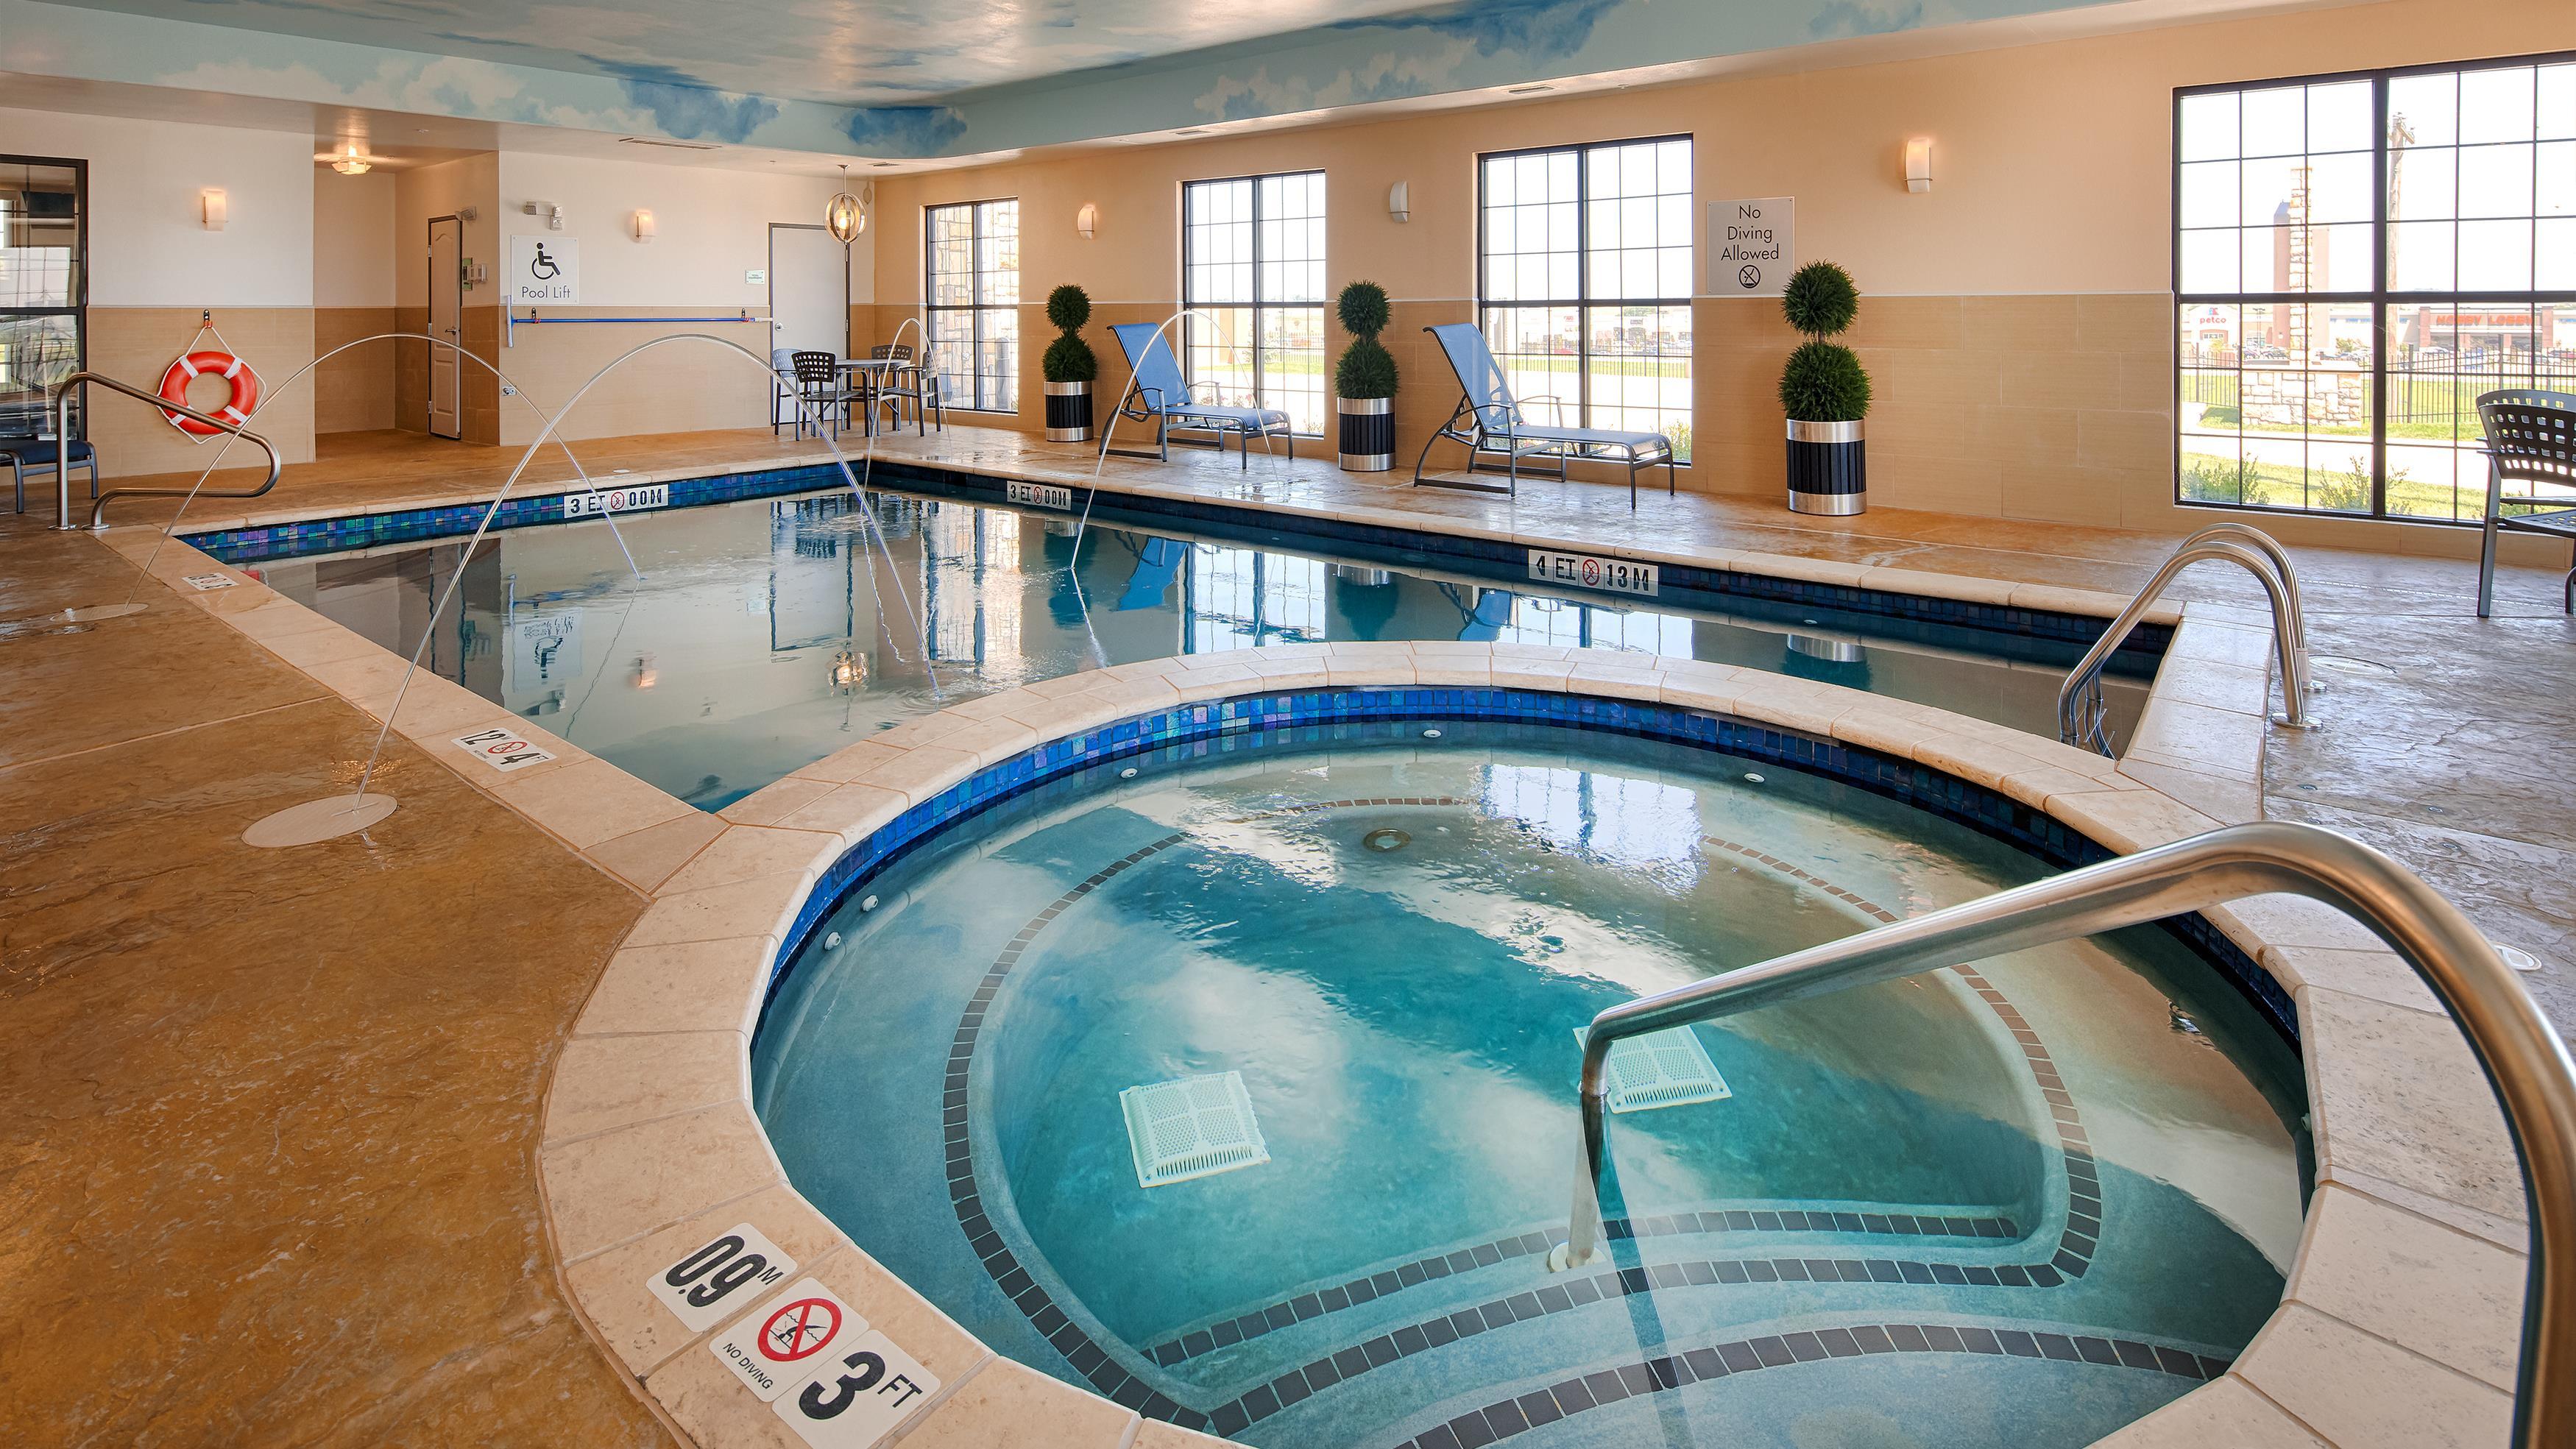 Best western plus emerald inn suites in garden city ks for Garden city pool